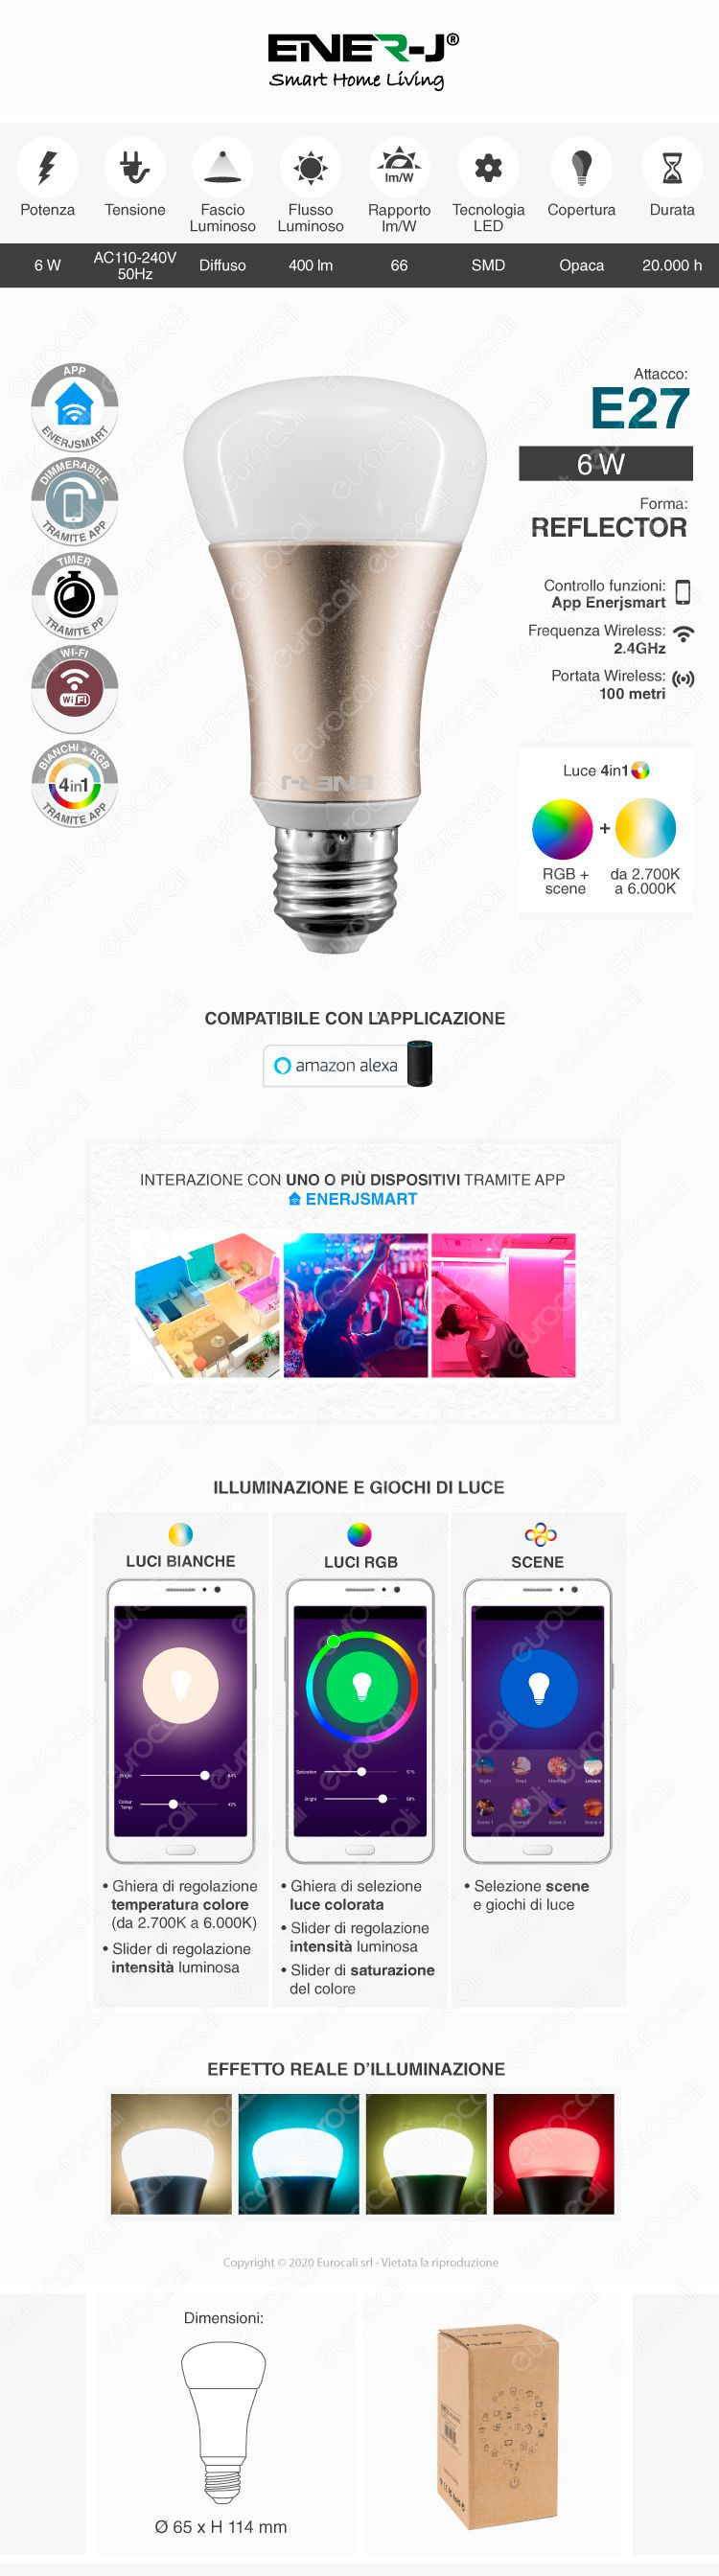 Ener-J Lampadina LED Wi-Fi E27 5W RGB+W Dimmerabile